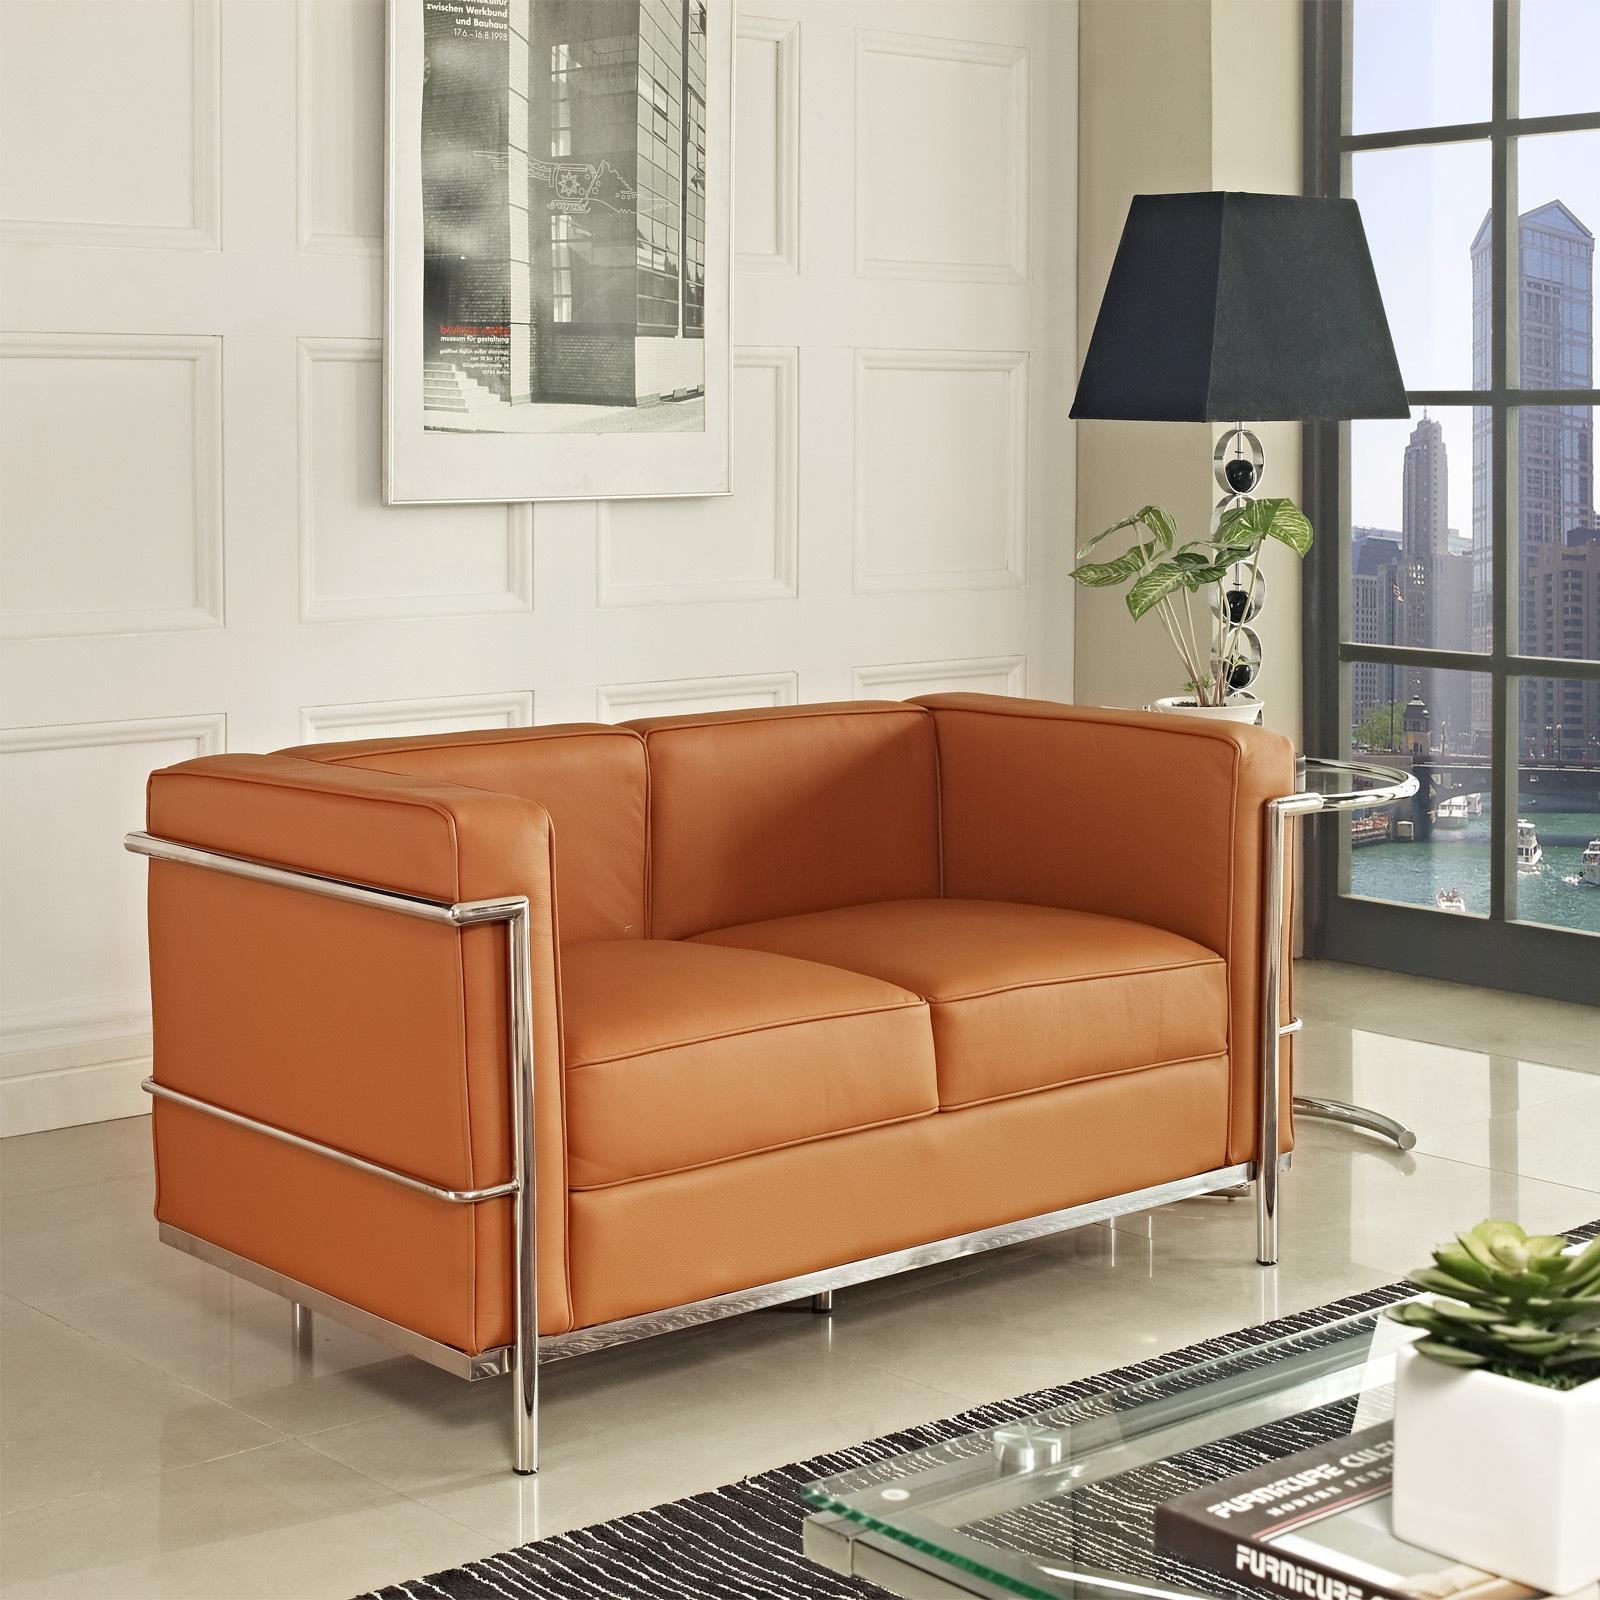 Modway Le Corbusier LC2 Tan Genuine Leather Loveseat (Le ...